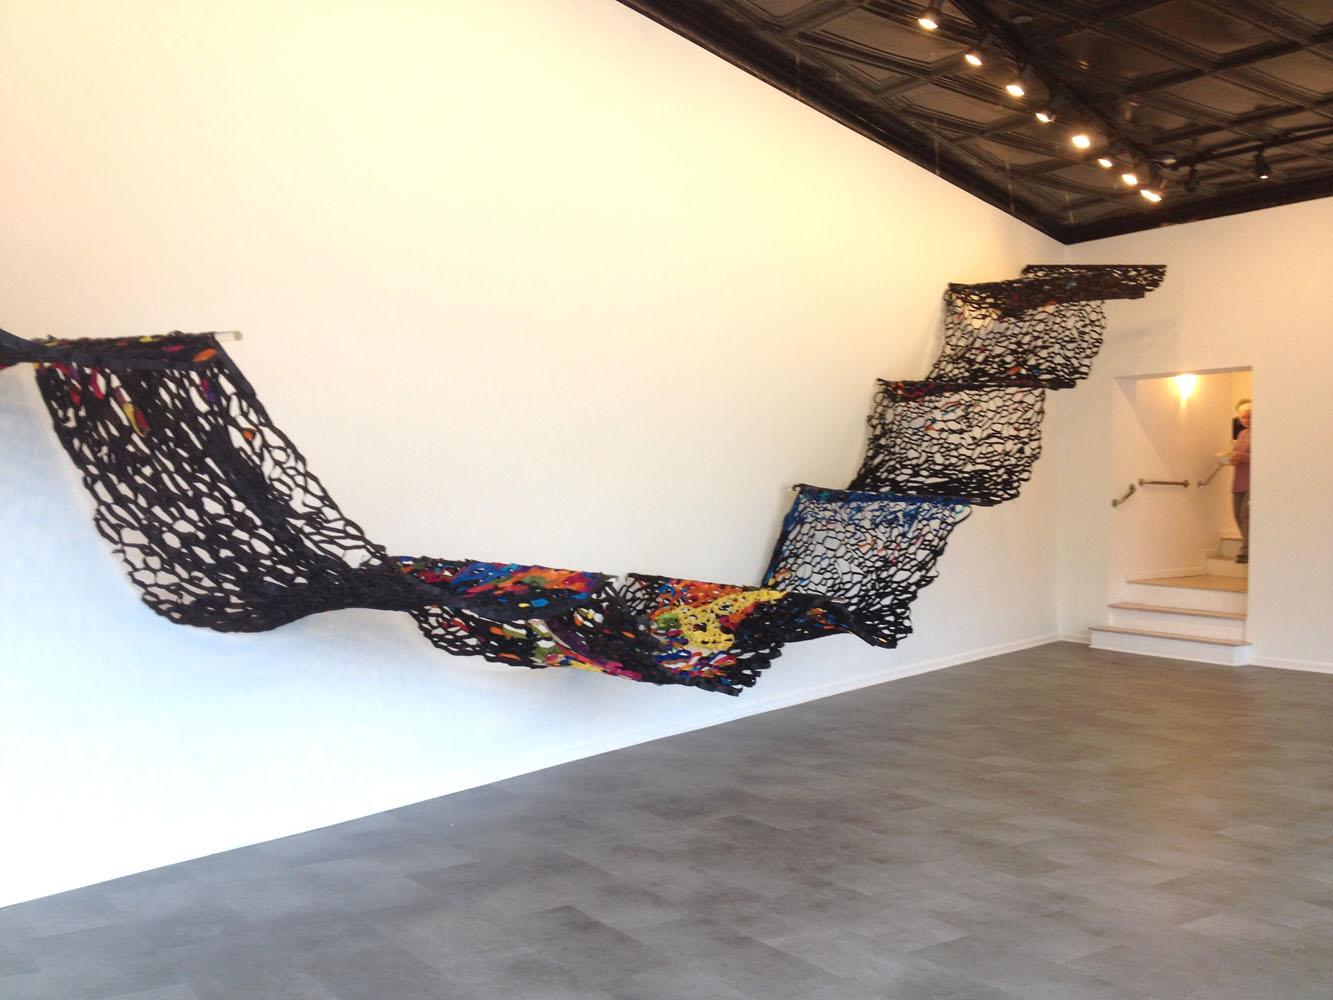 Tar Roofing Paper Suzan Shutan Installation Artist